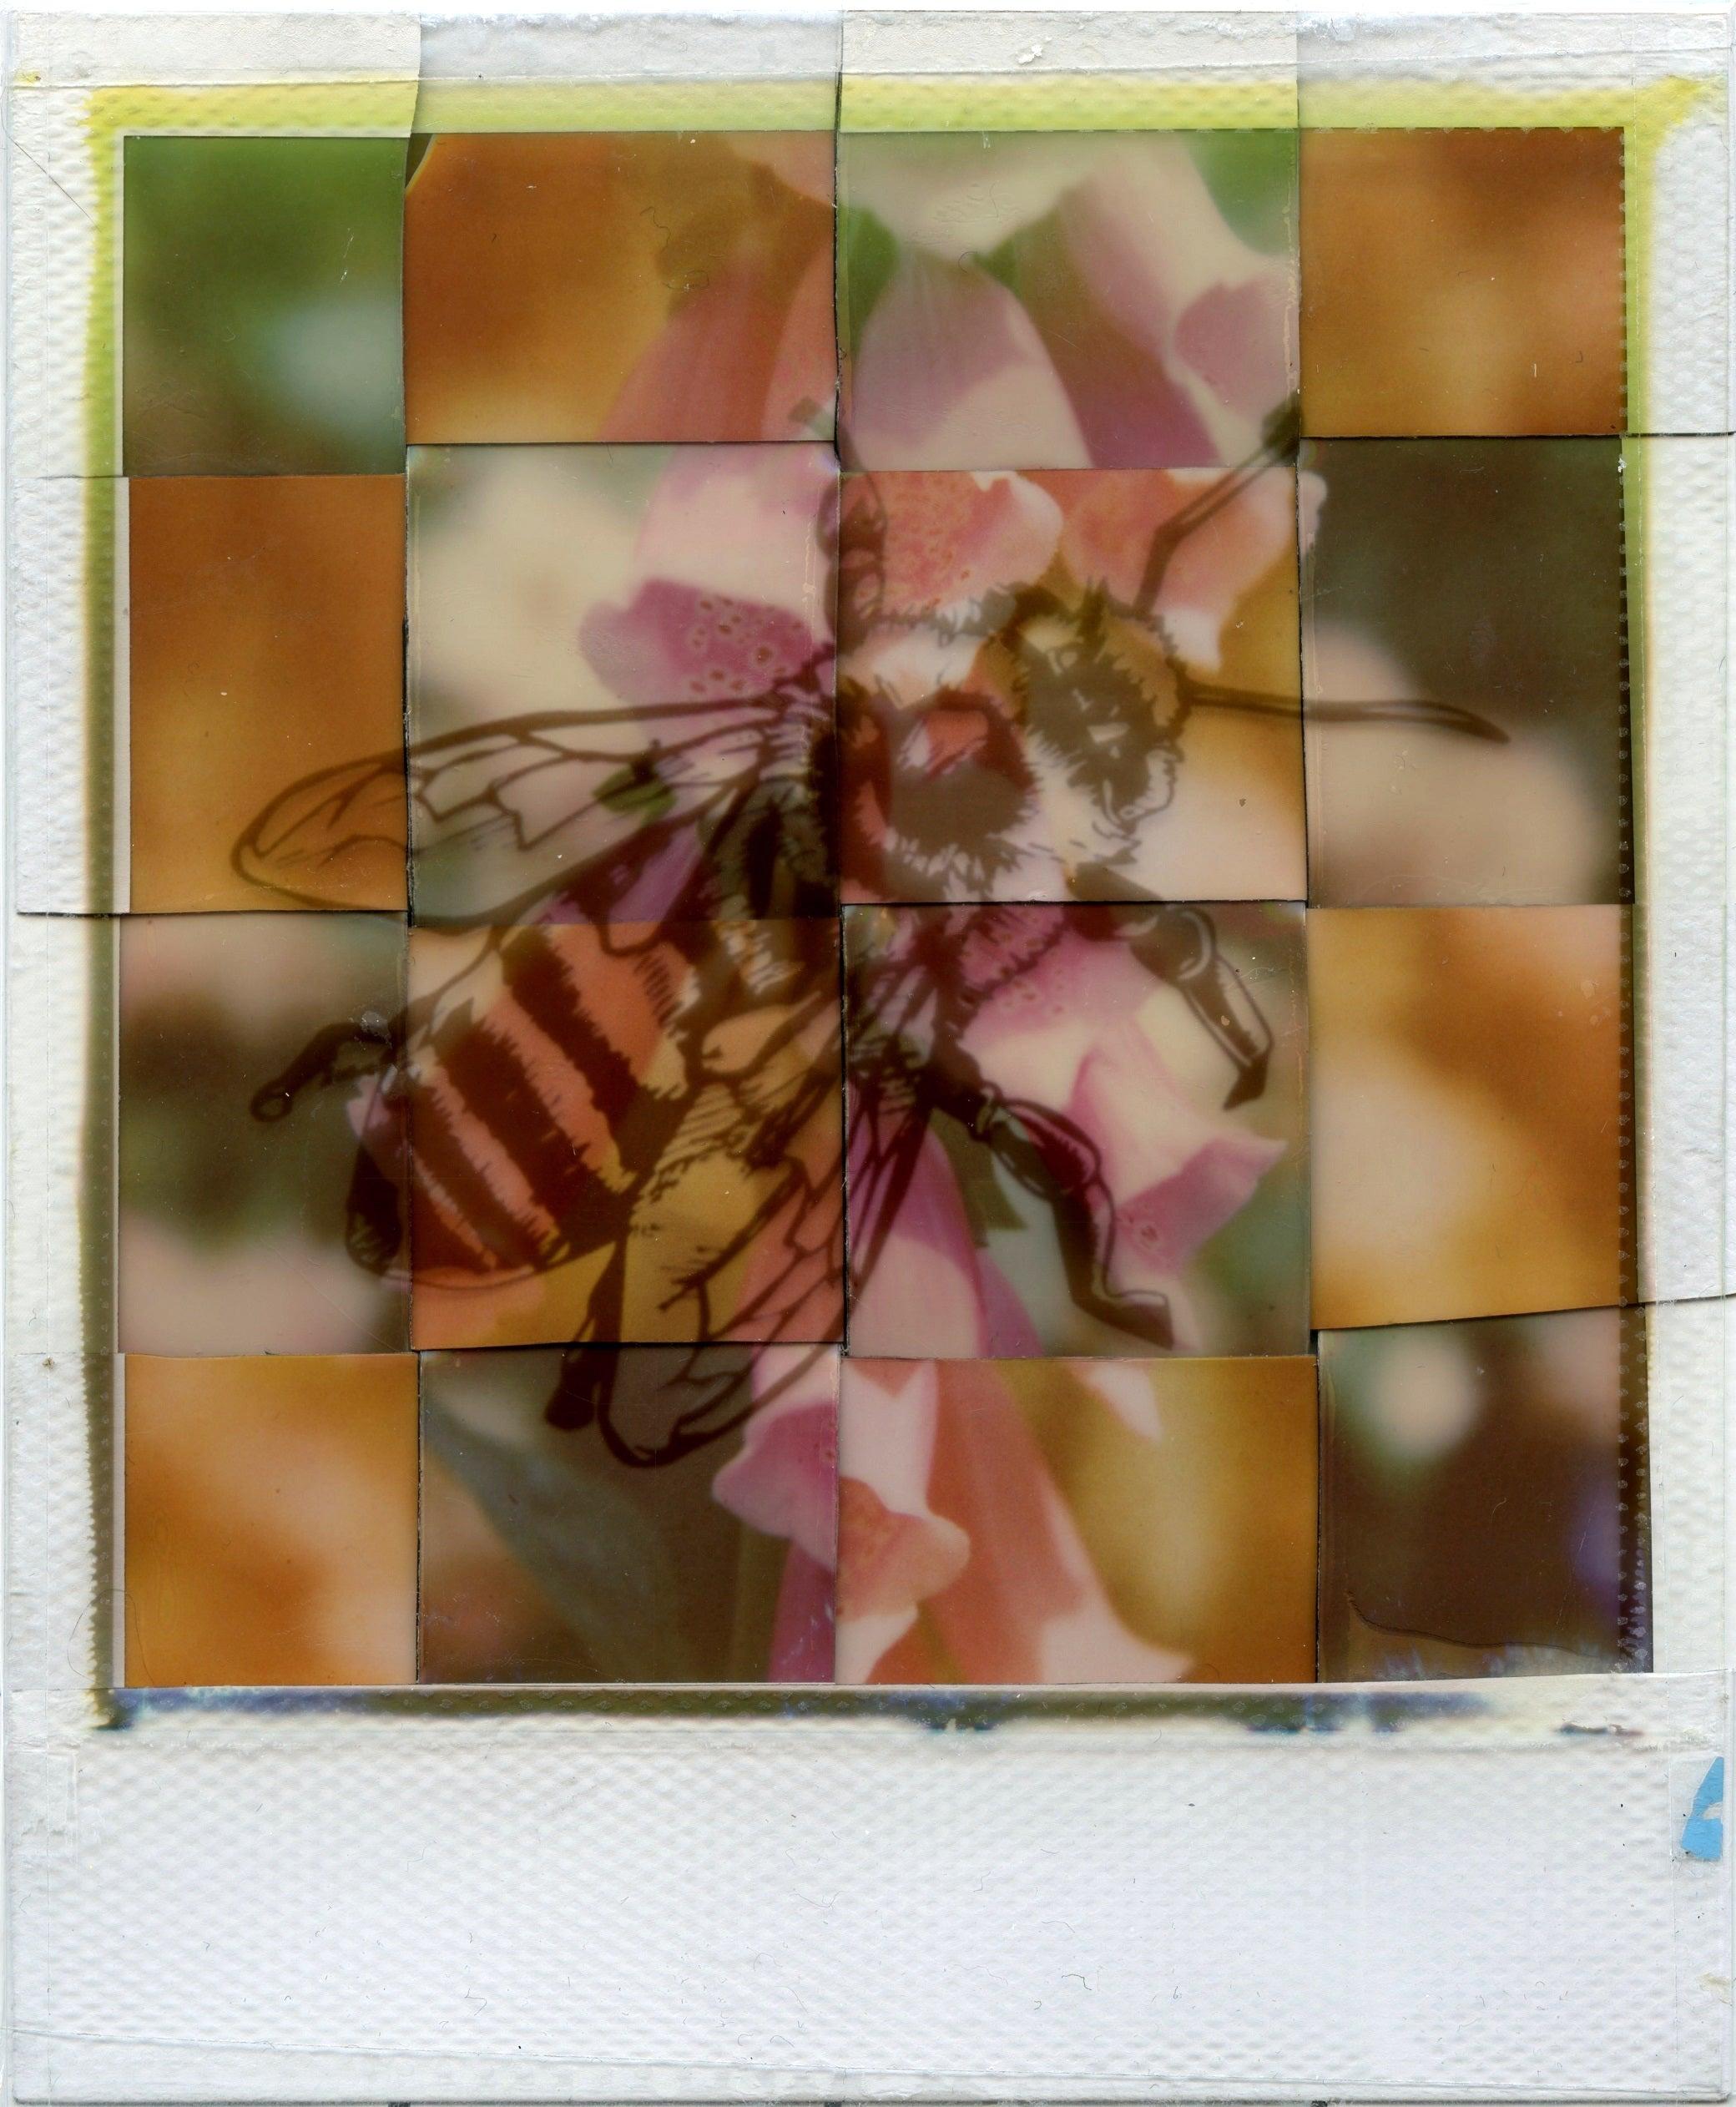 Generation A - Polaroid, Bees. Contemporary, Environment